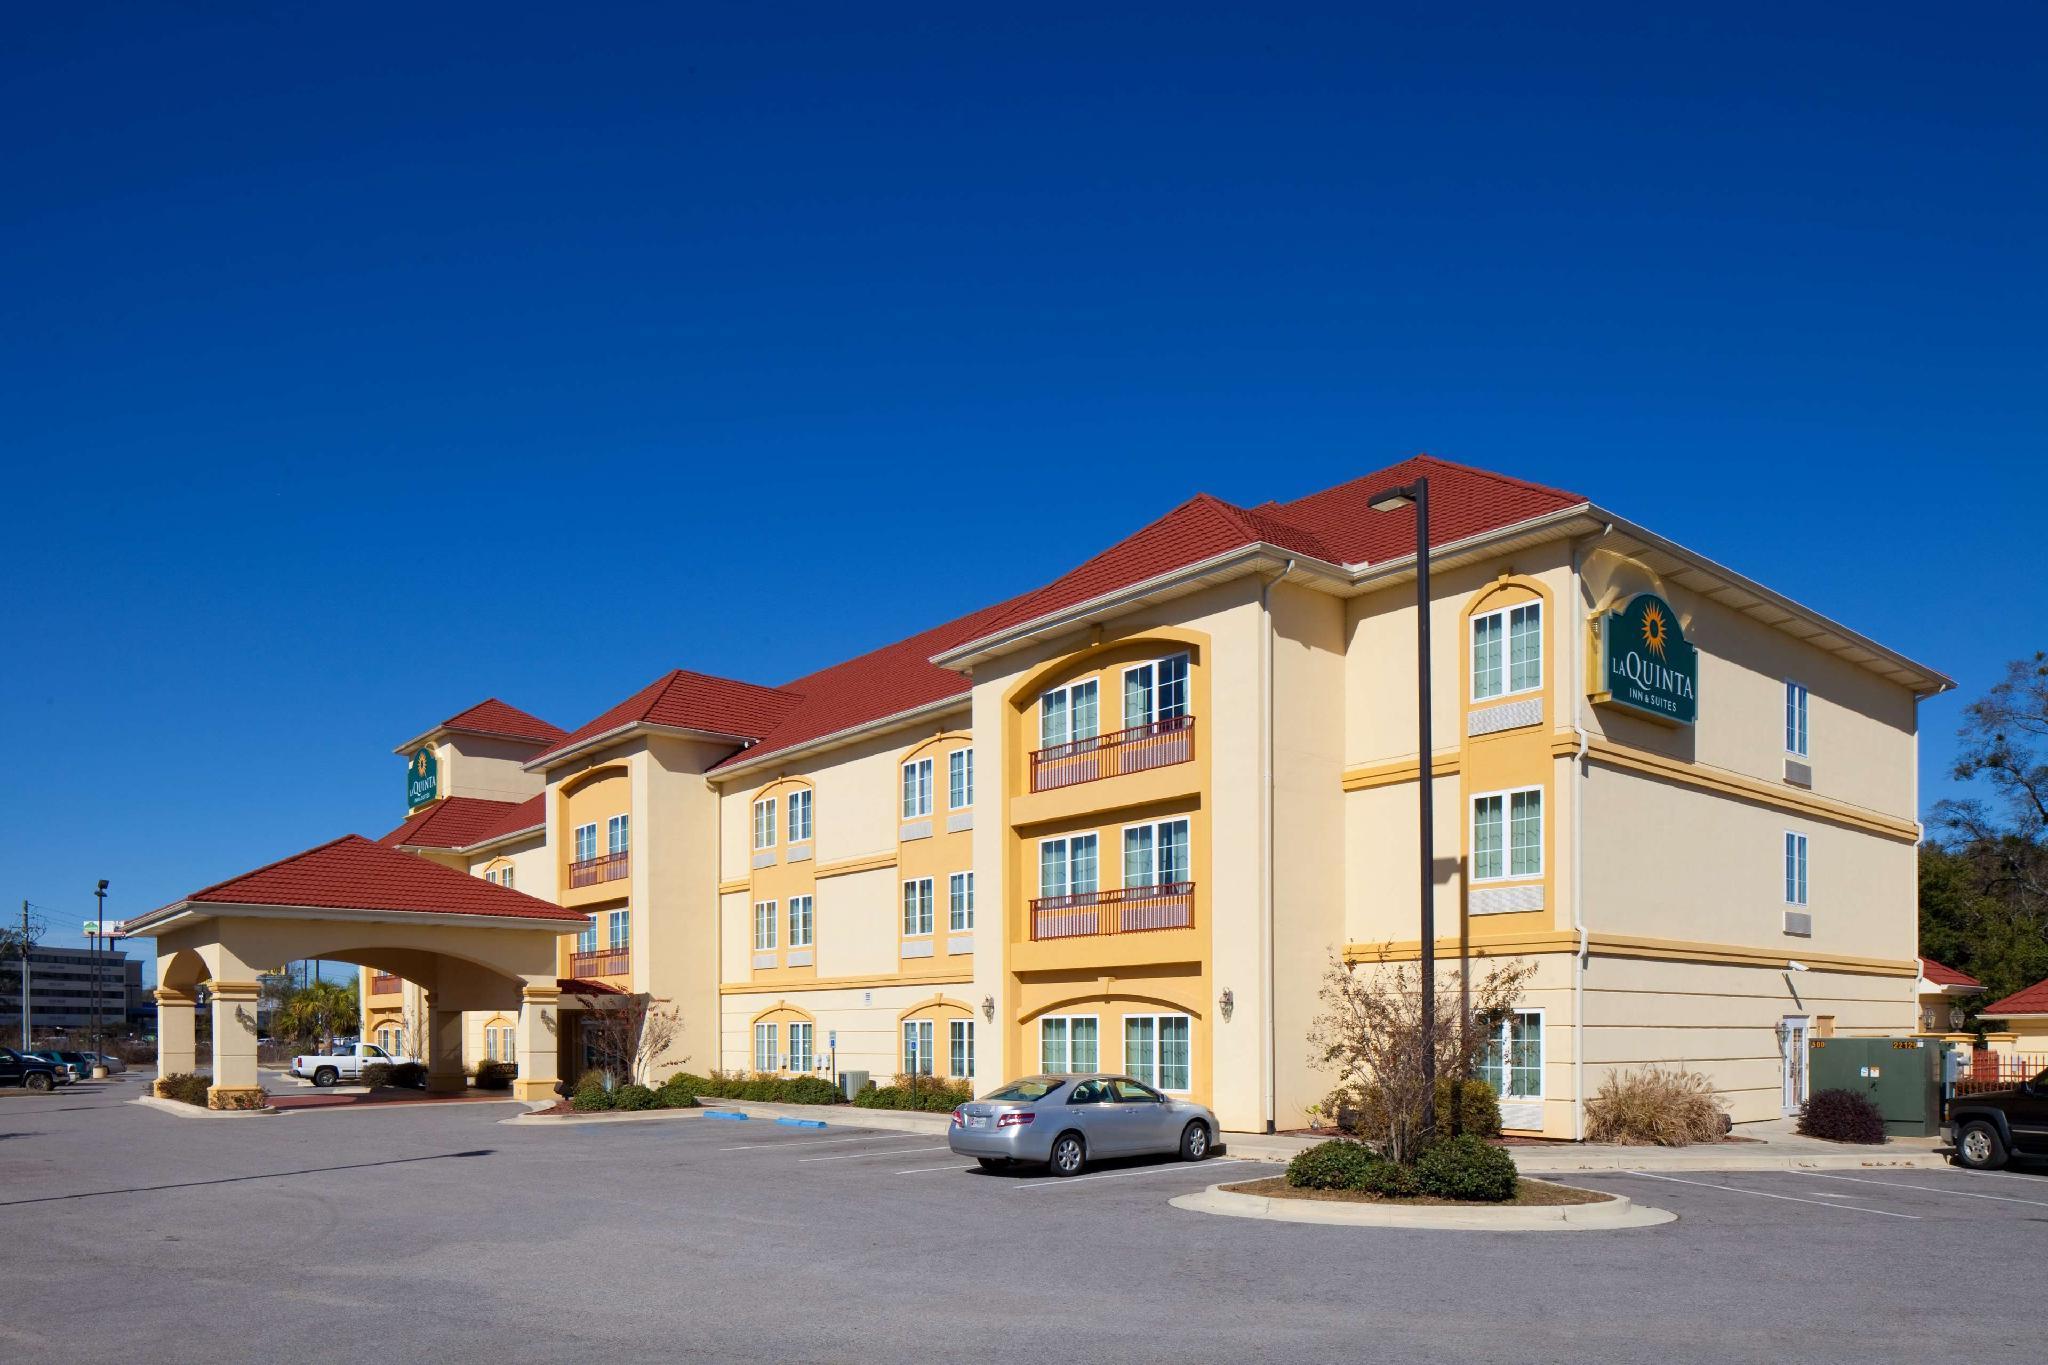 La Quinta Inn And Suites By Wyndham Mobile   Tillman's Corner